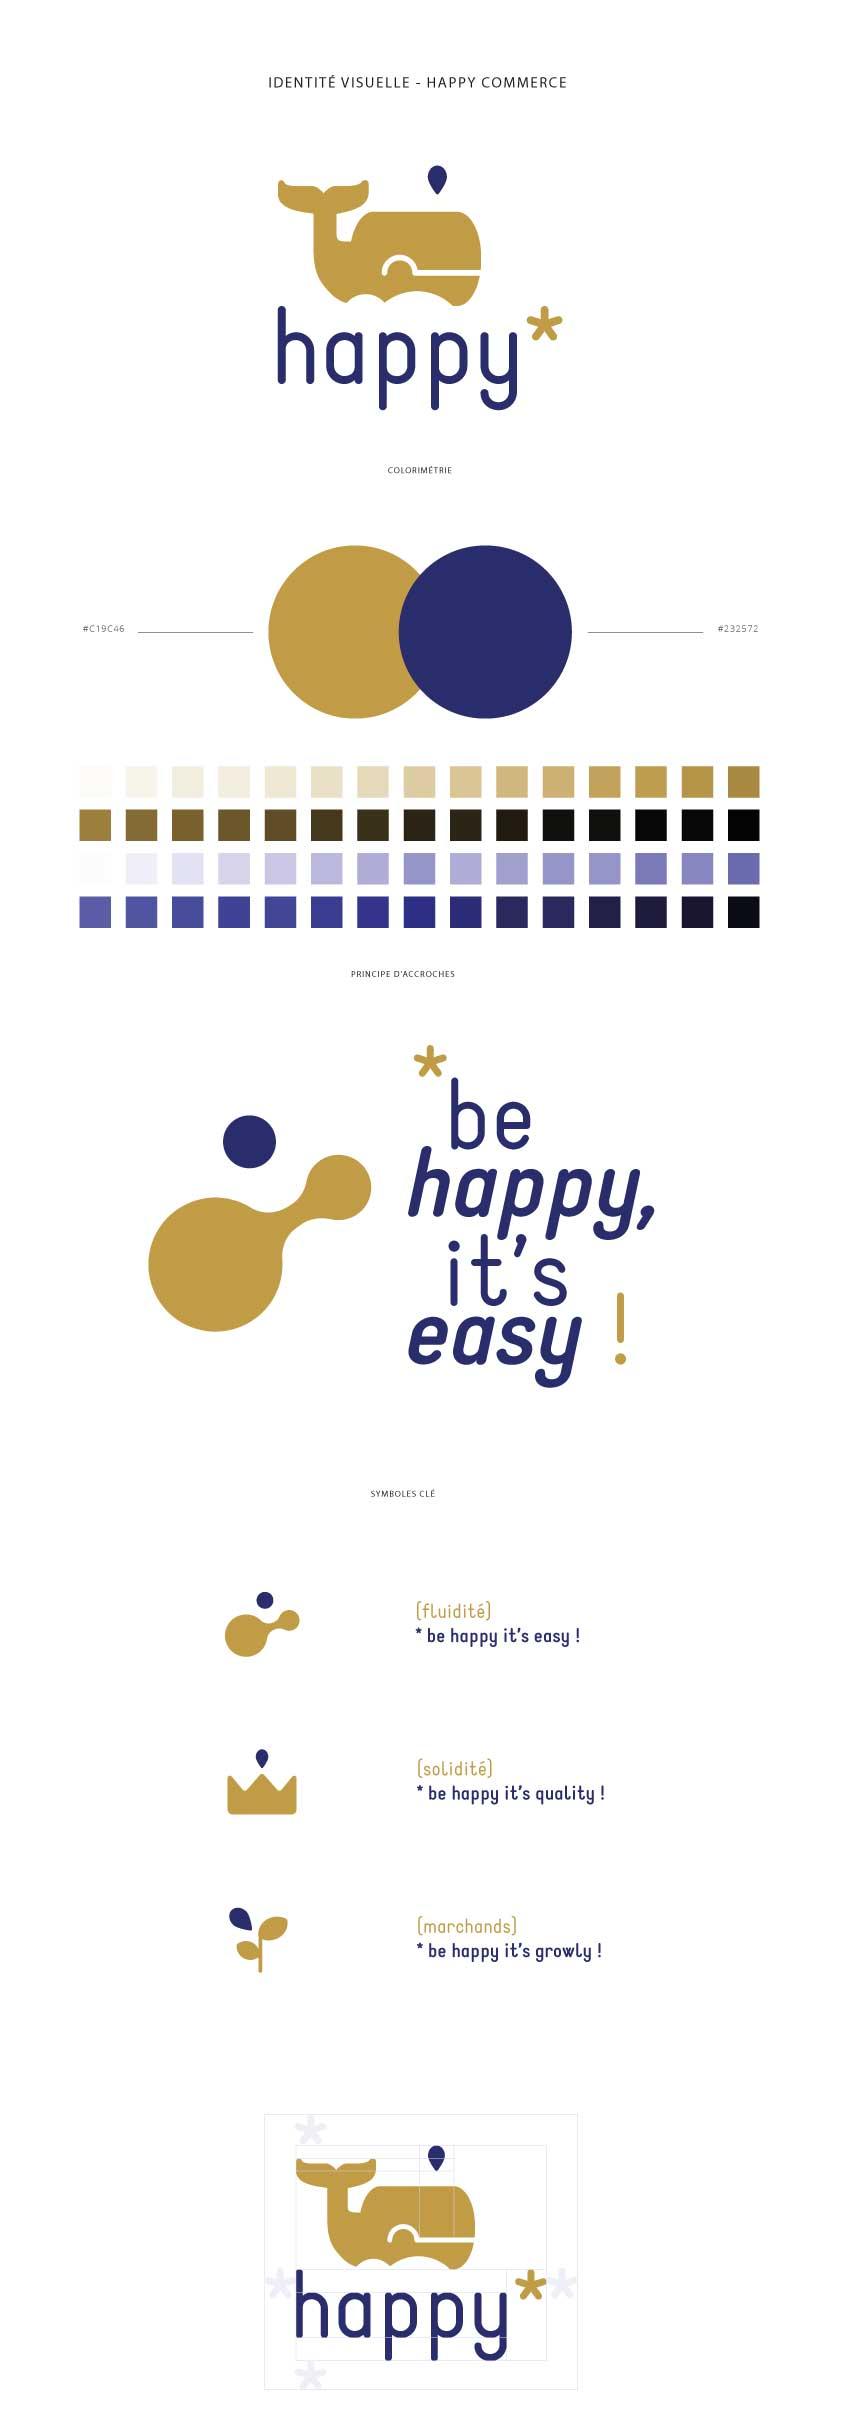 Branding-Happy-Commerce-By-Aitana-Design